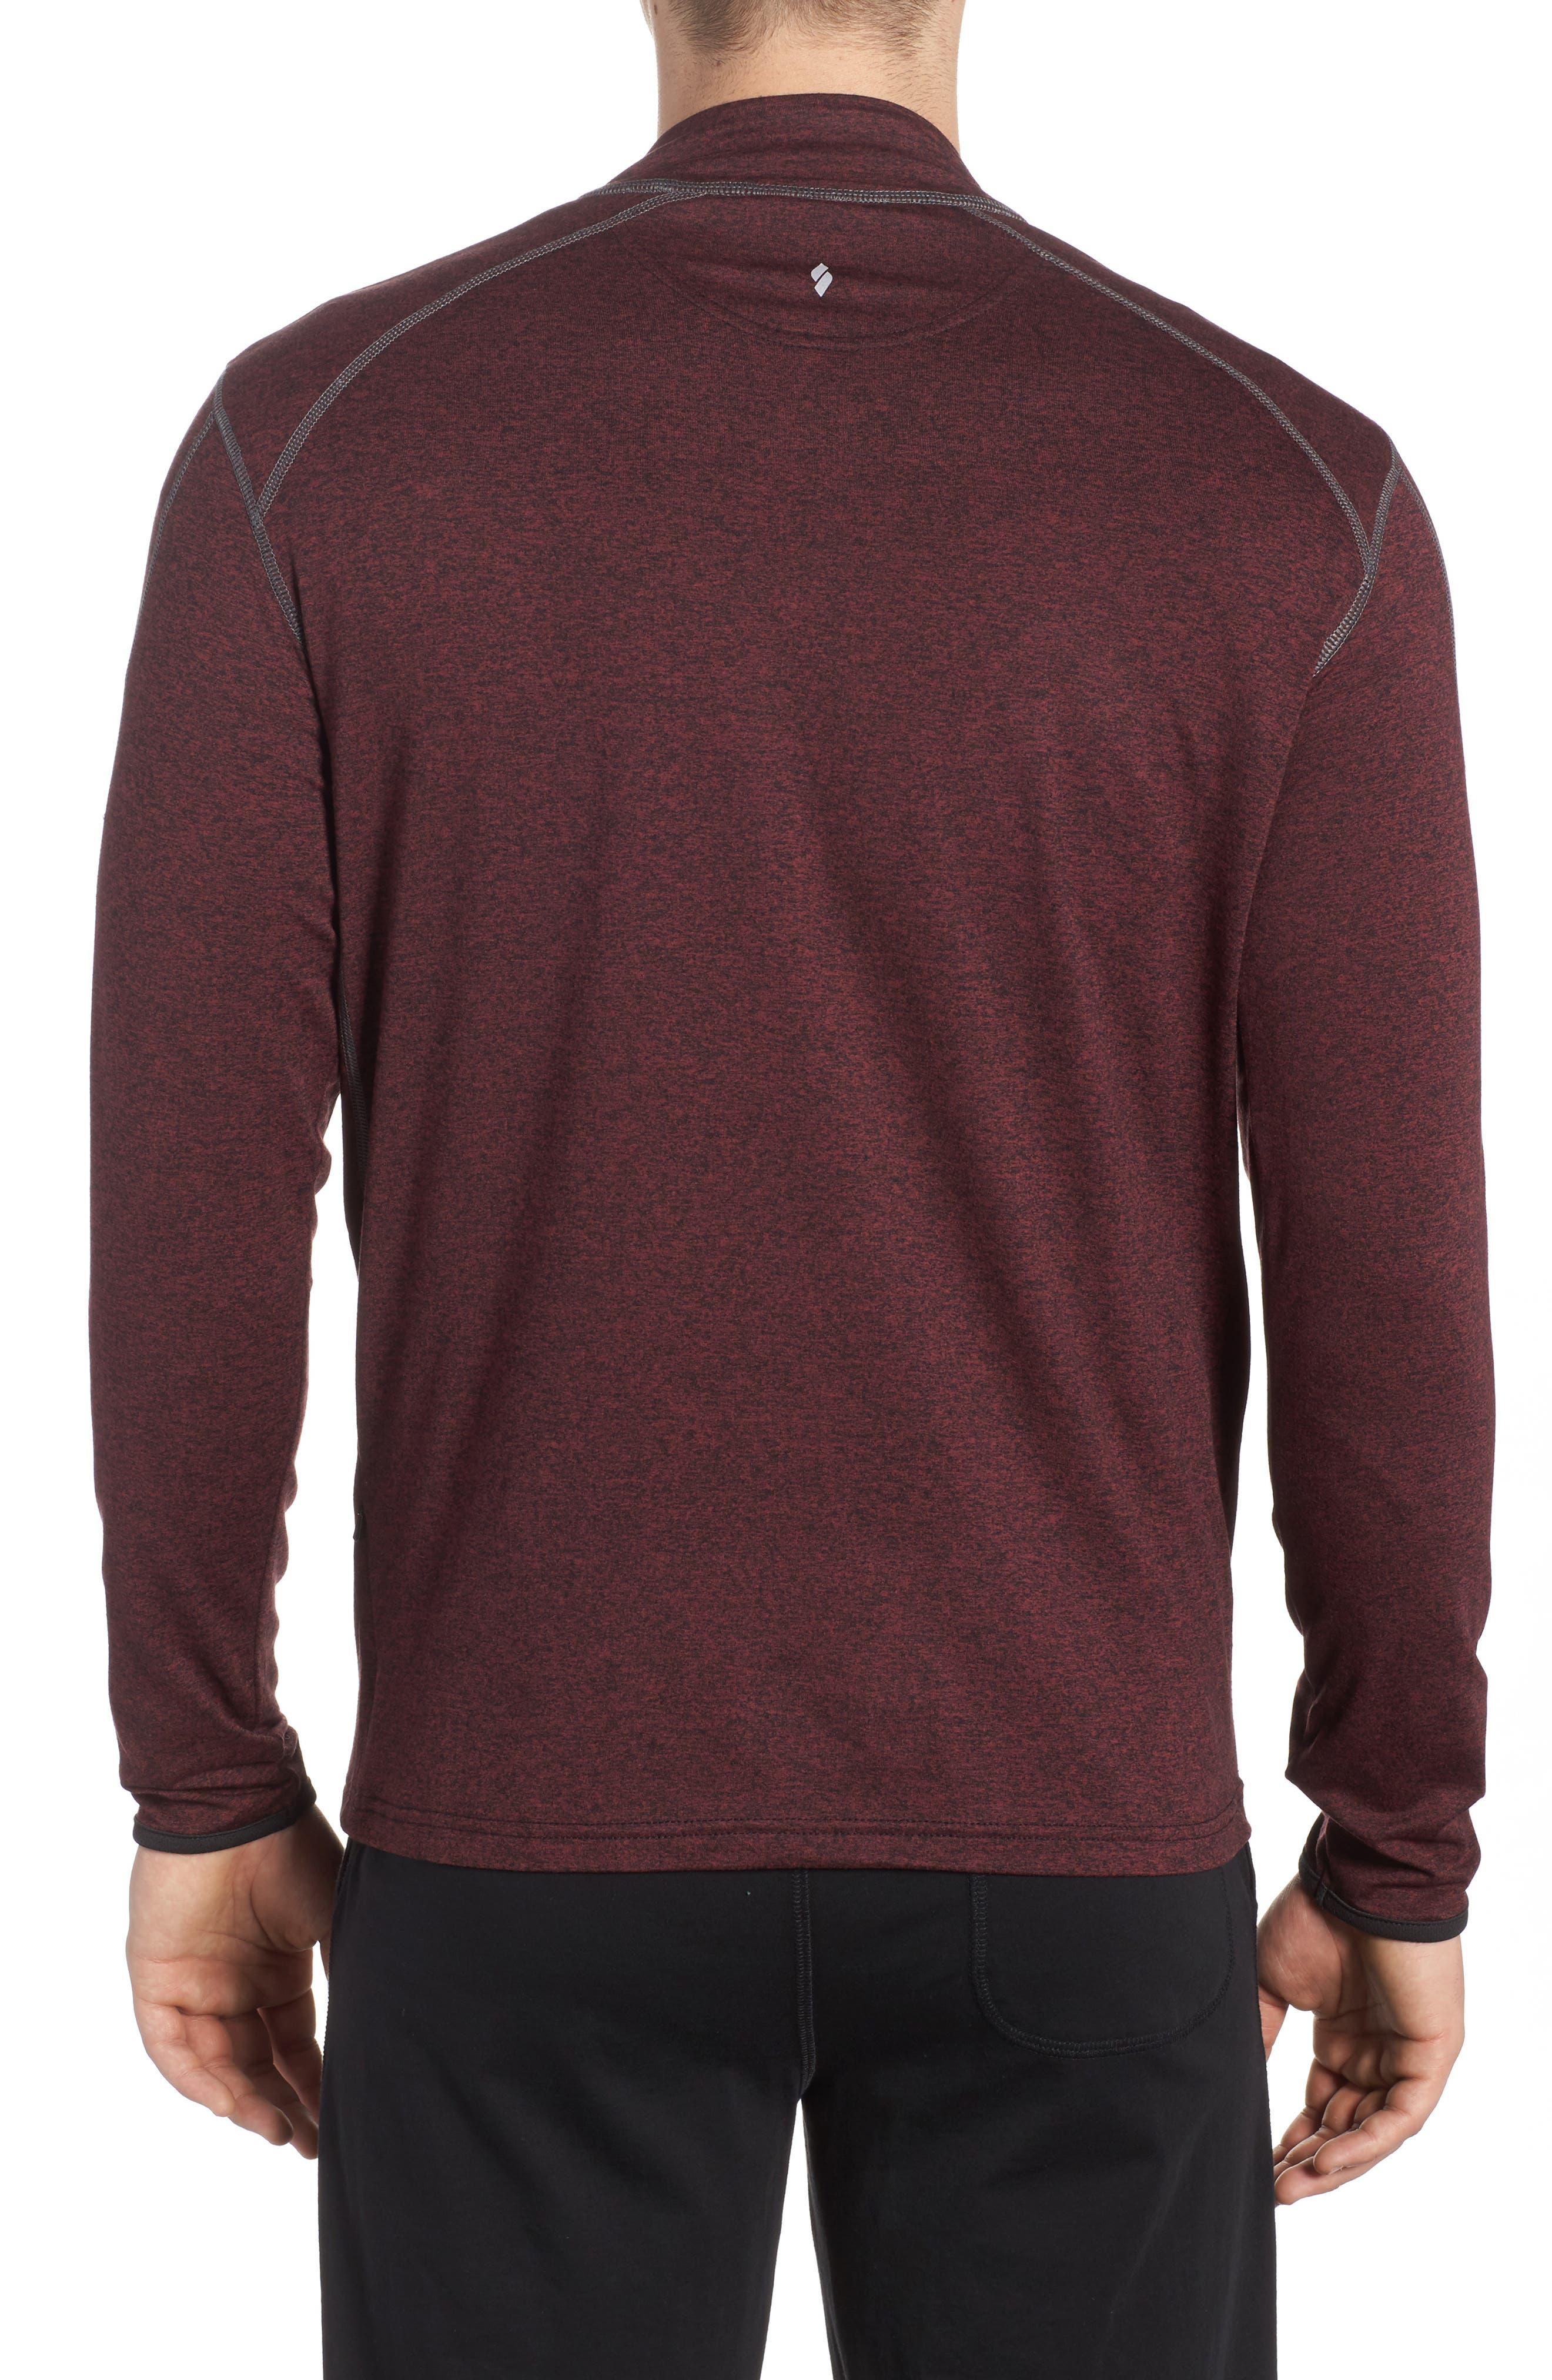 Alternate Image 2  - SODO 'Elevate' Moisture Wicking Stretch Quarter Zip Pullover